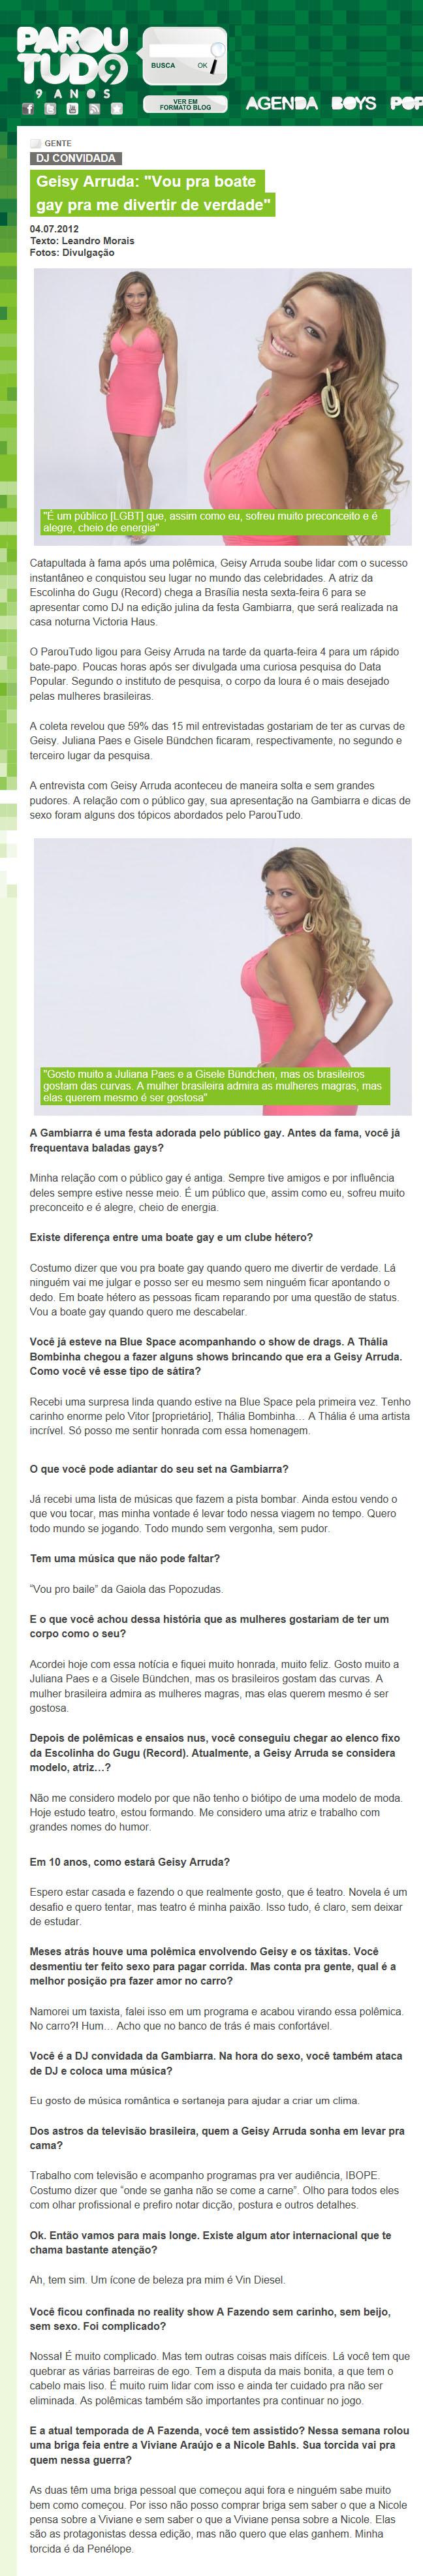 Parou_Tudo_Brasilia